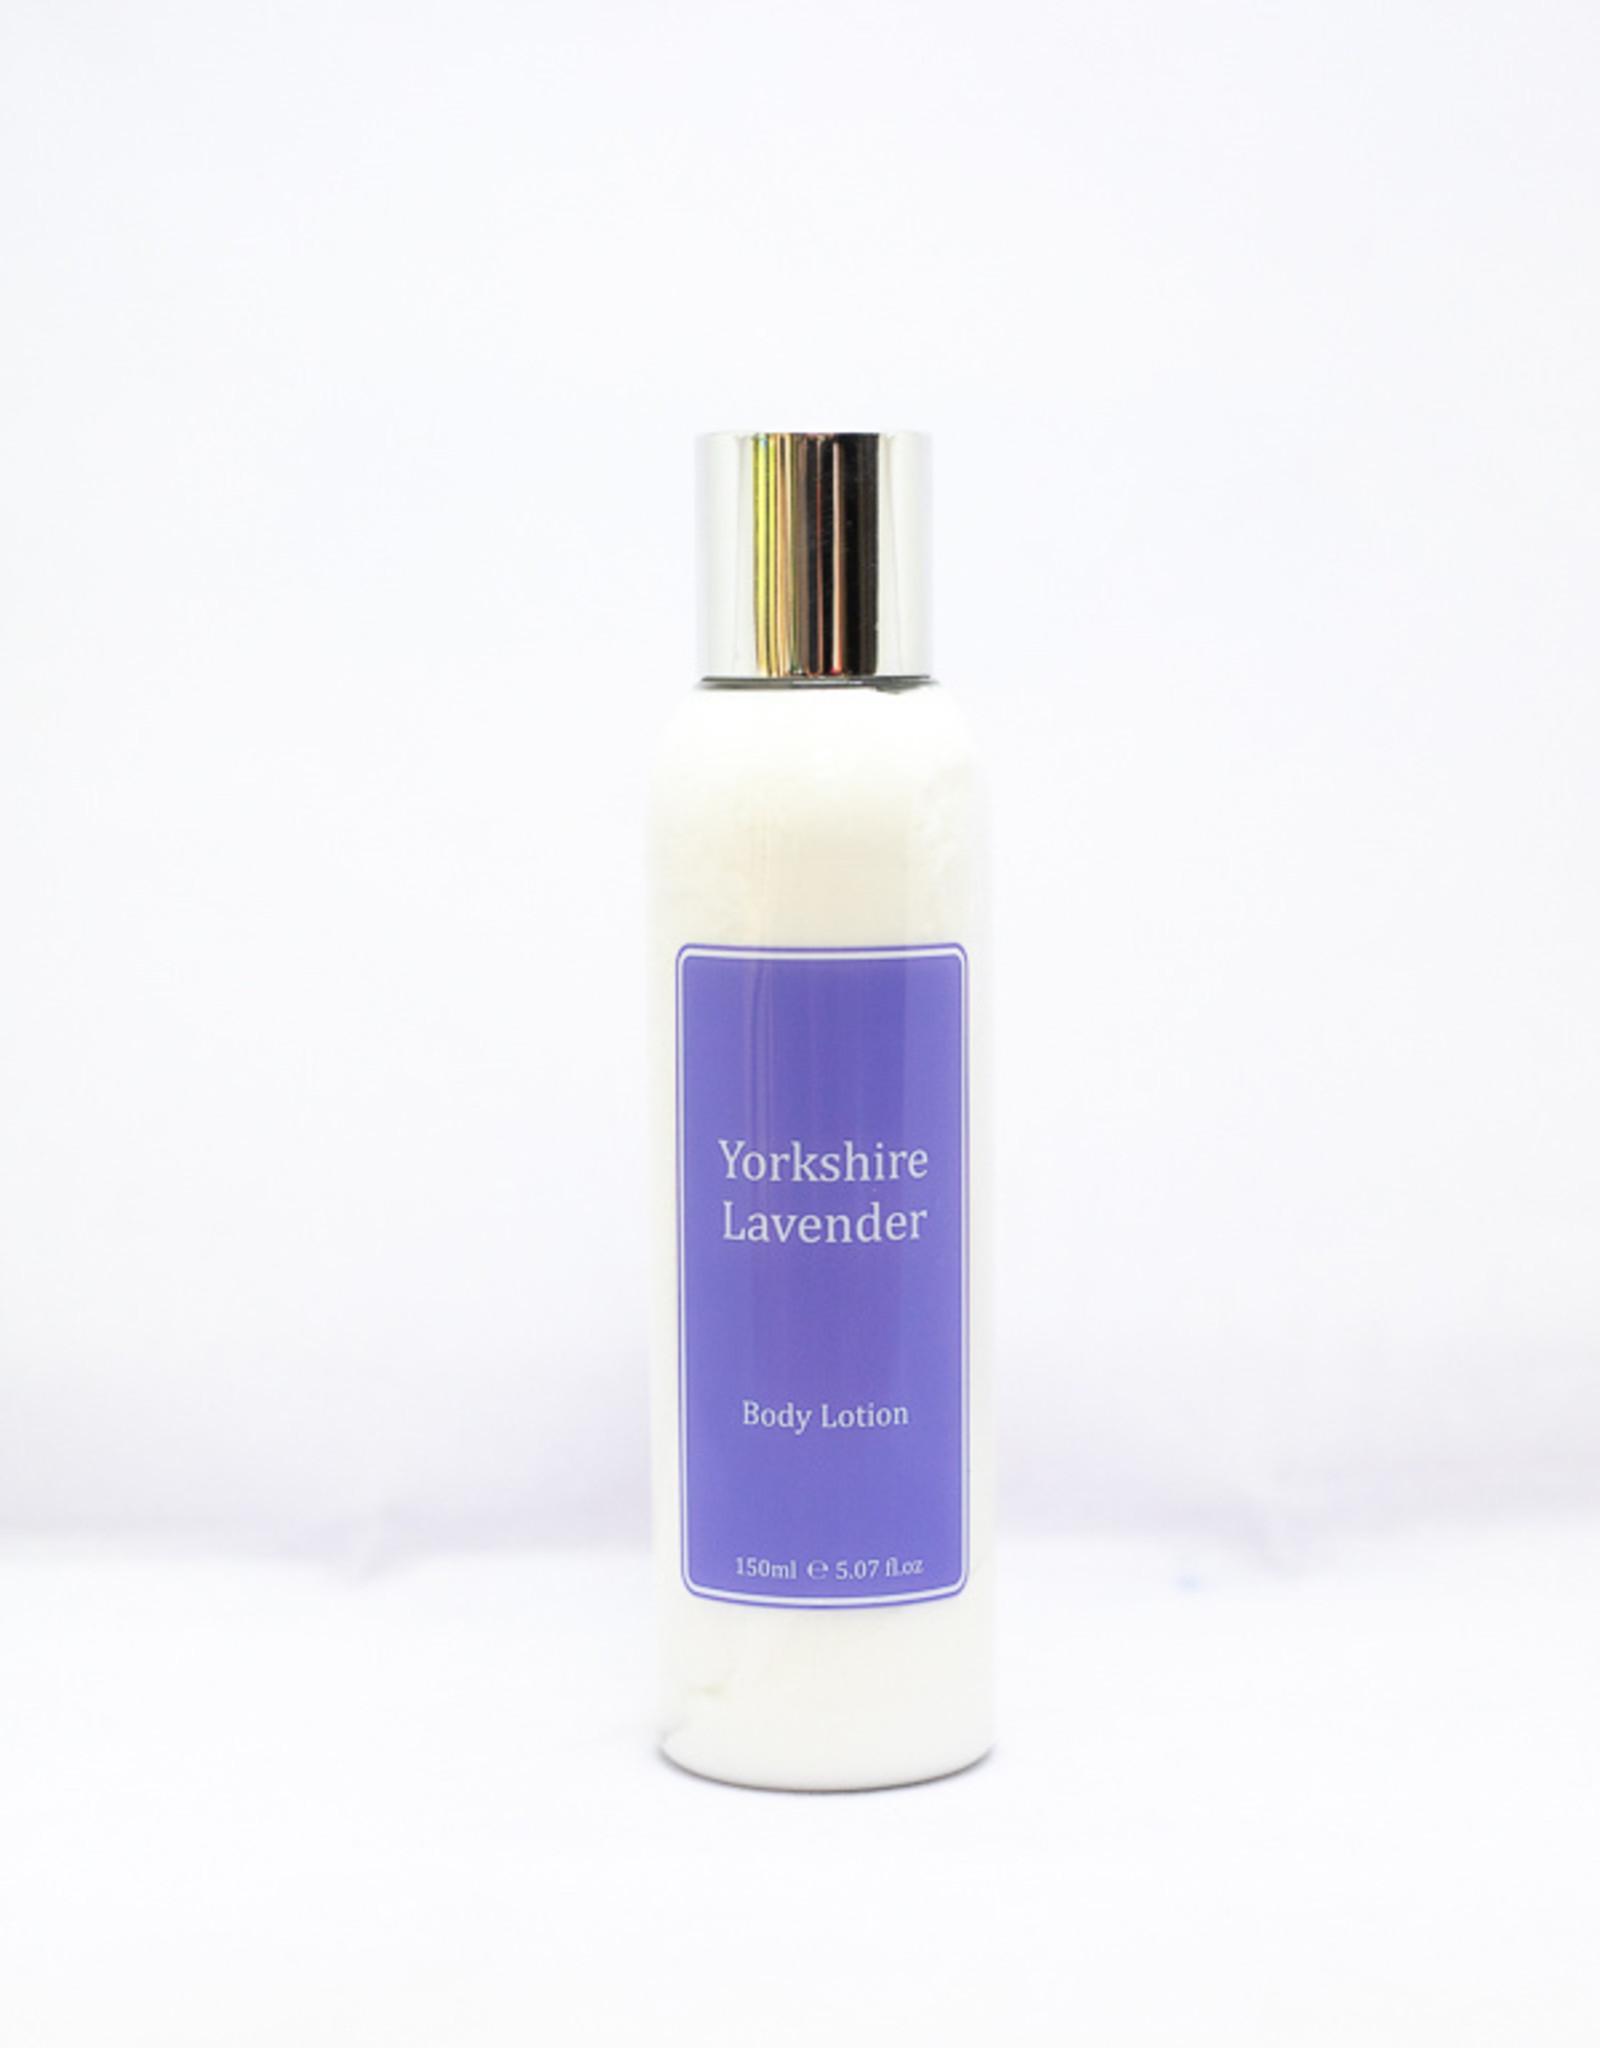 Yorkshire Lavender Body Lotion